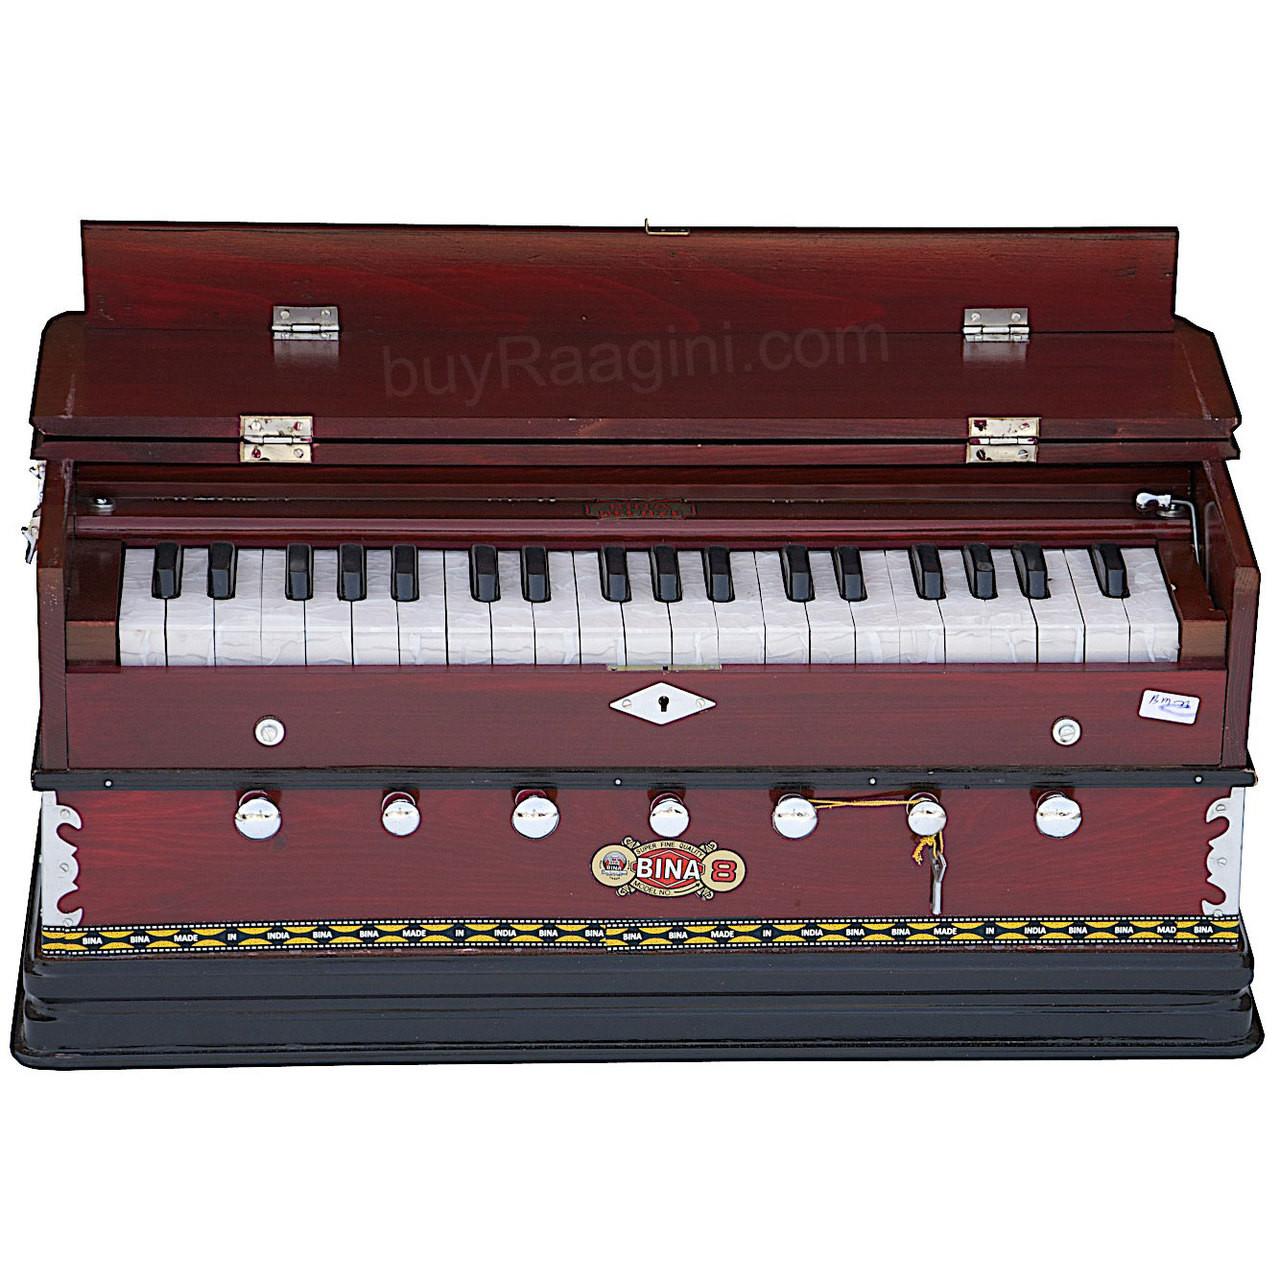 BINA NO  8 Harmonium, 2 Reeds, 3 25 Octaves, 7 Stops, Rosewood AGD